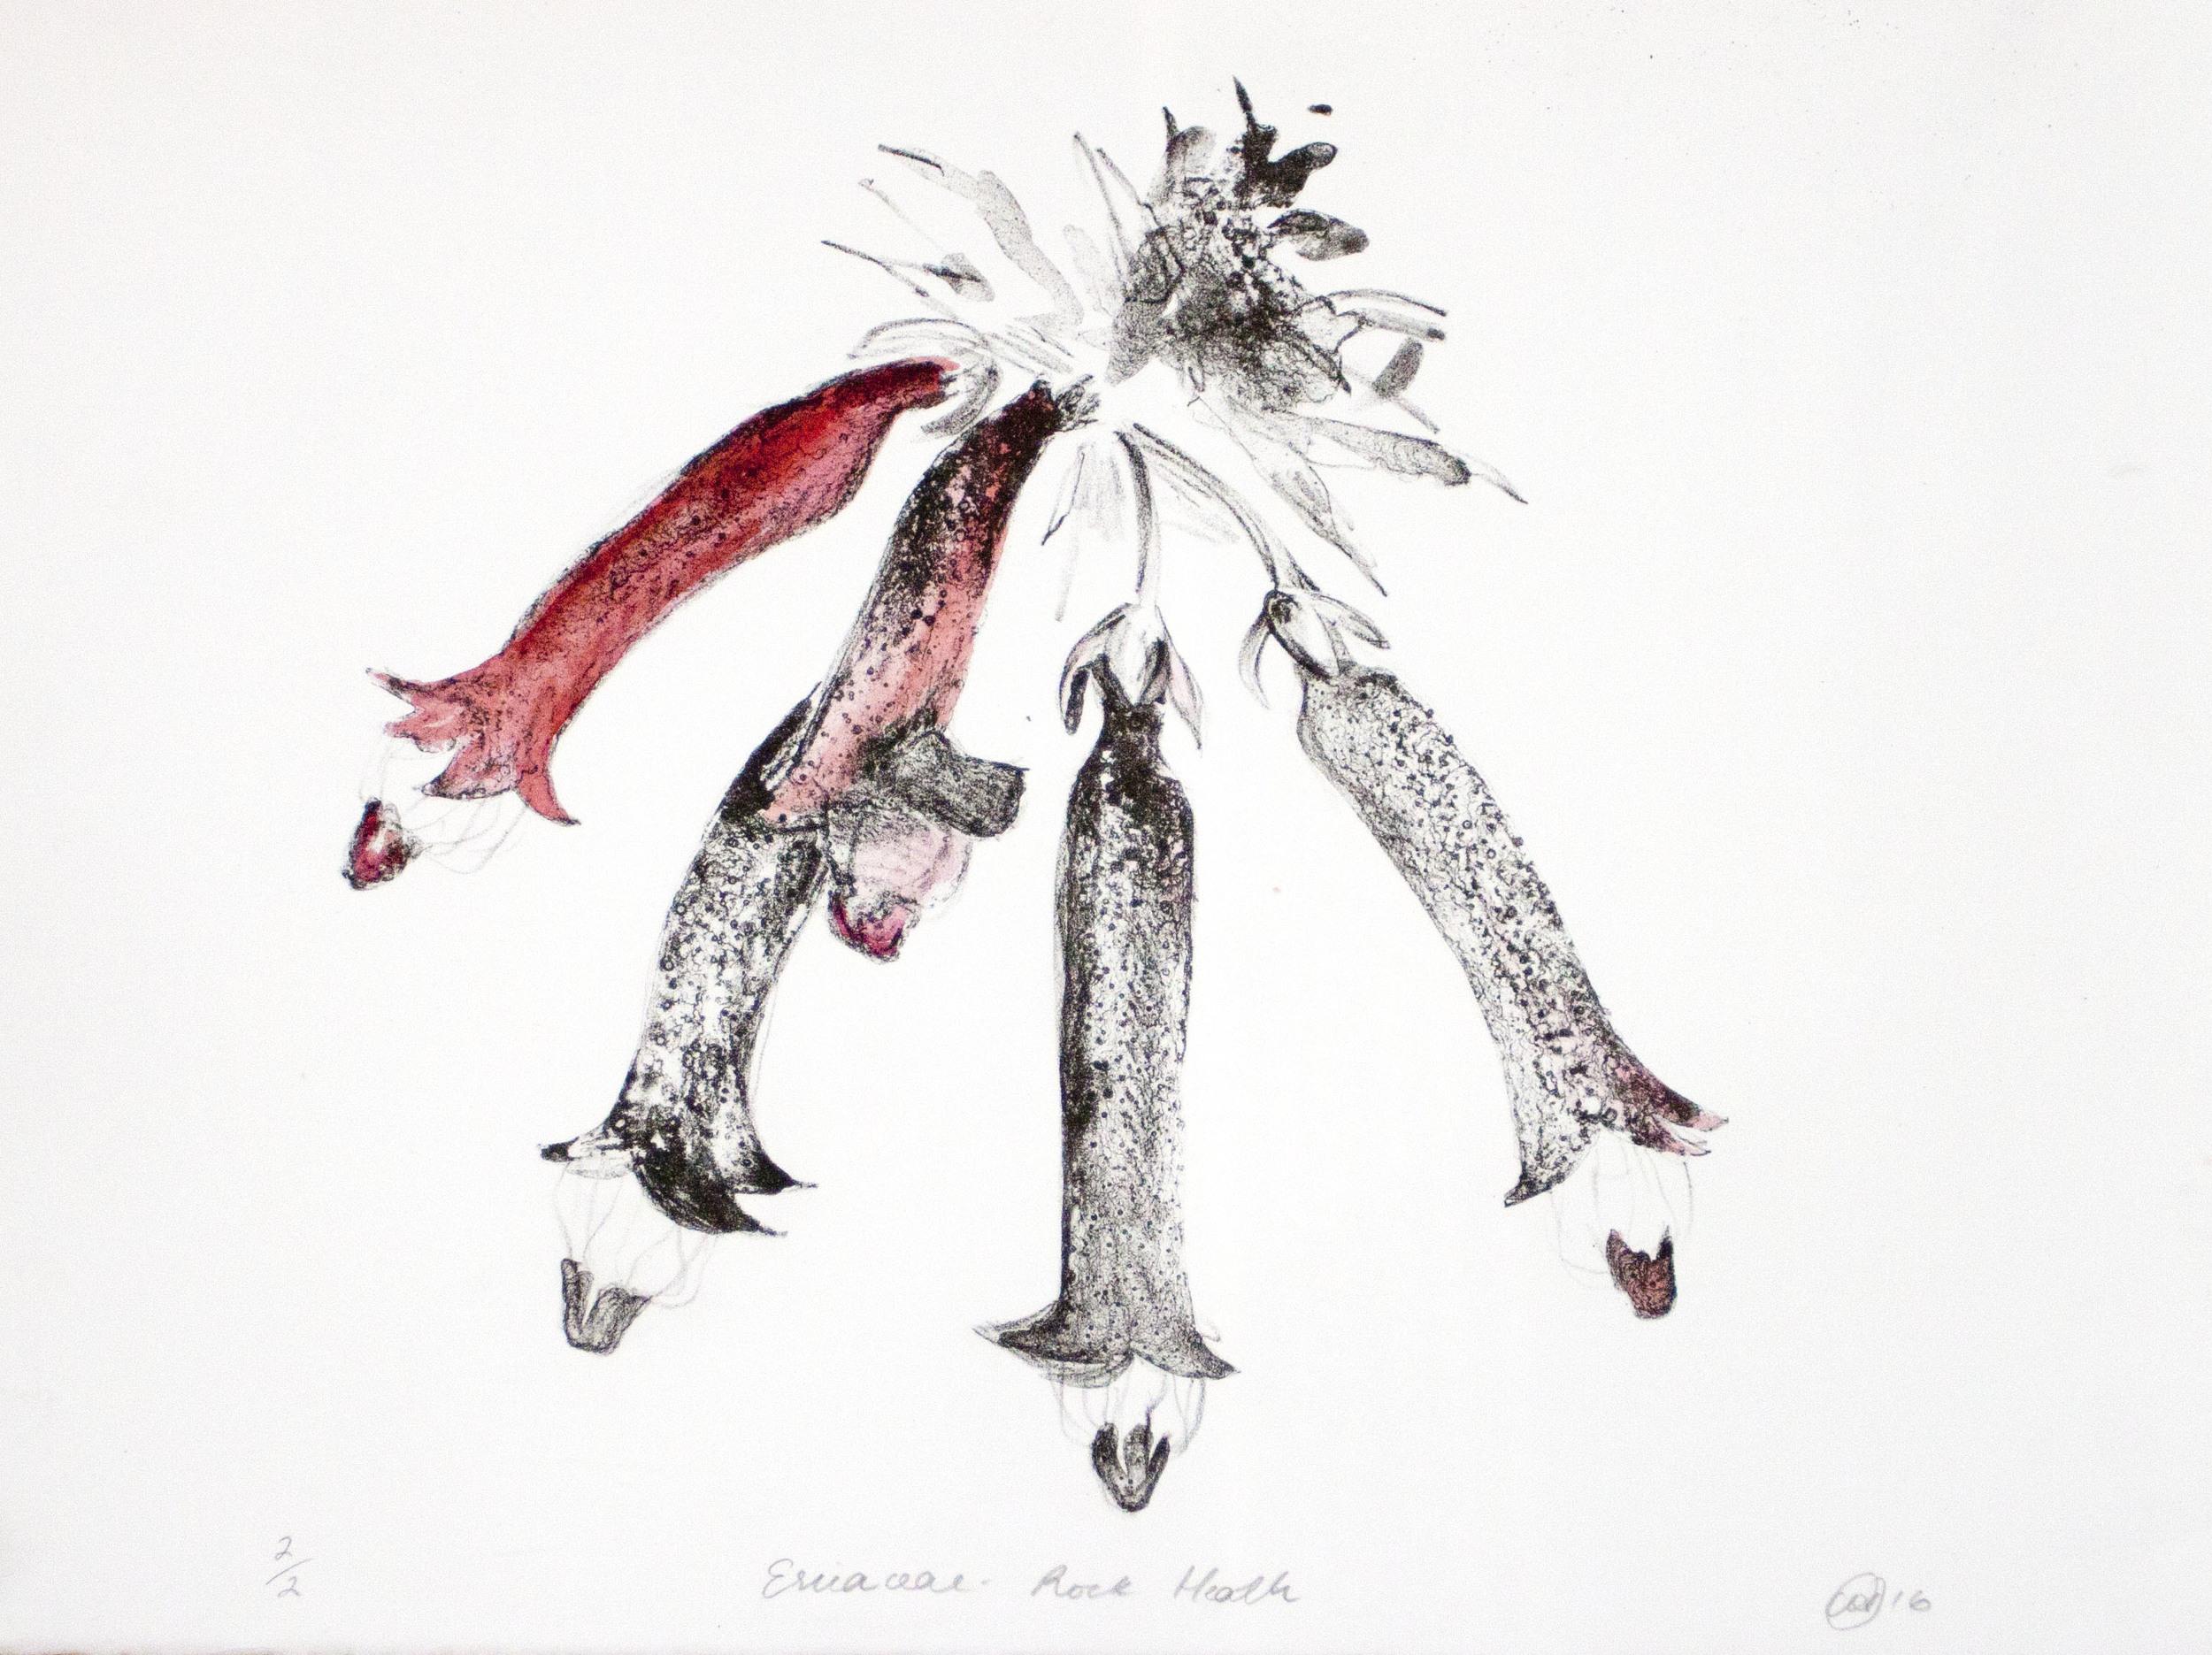 Ericaceae - Rock Heath   Hand-coloured Lithograph. 2016  30 x 40cm  $500 (F)  $300 (UF)